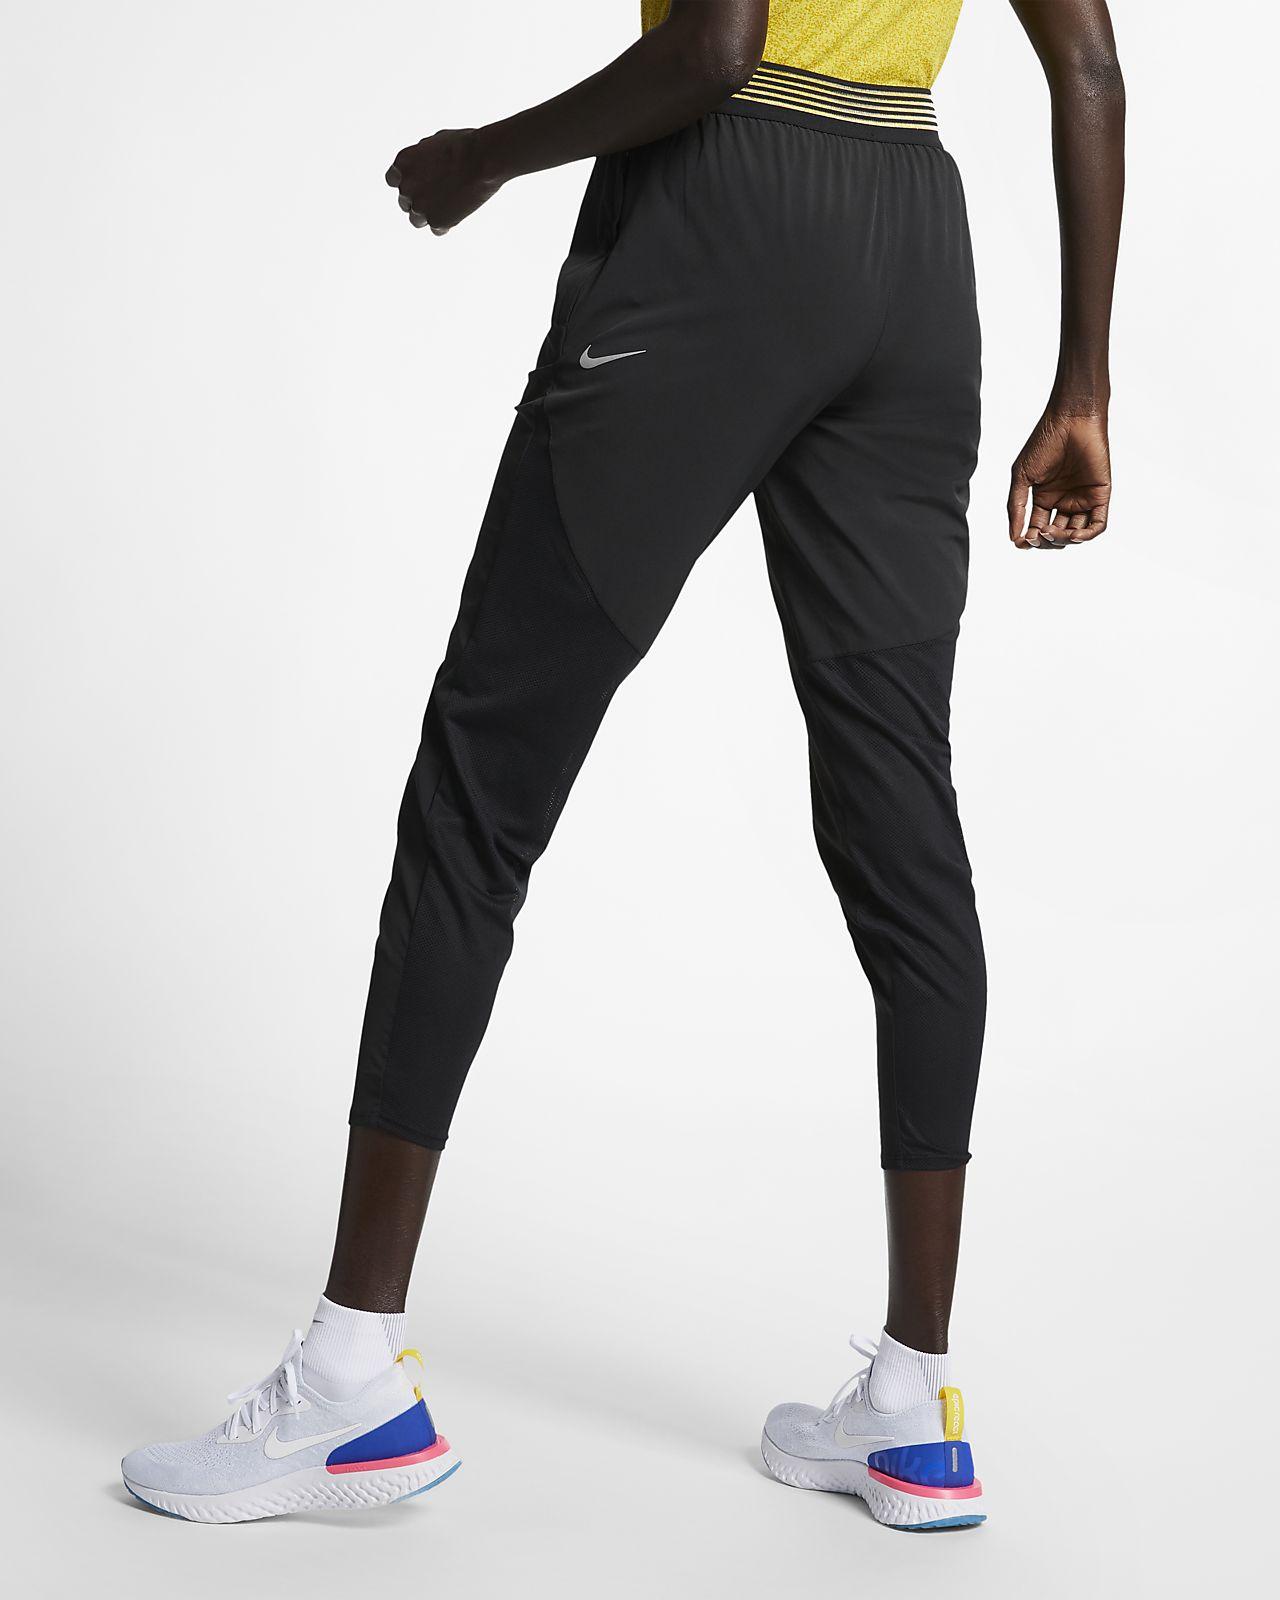 b24b75705896 Nike Flex Essential Women s Running Trousers. Nike.com LU